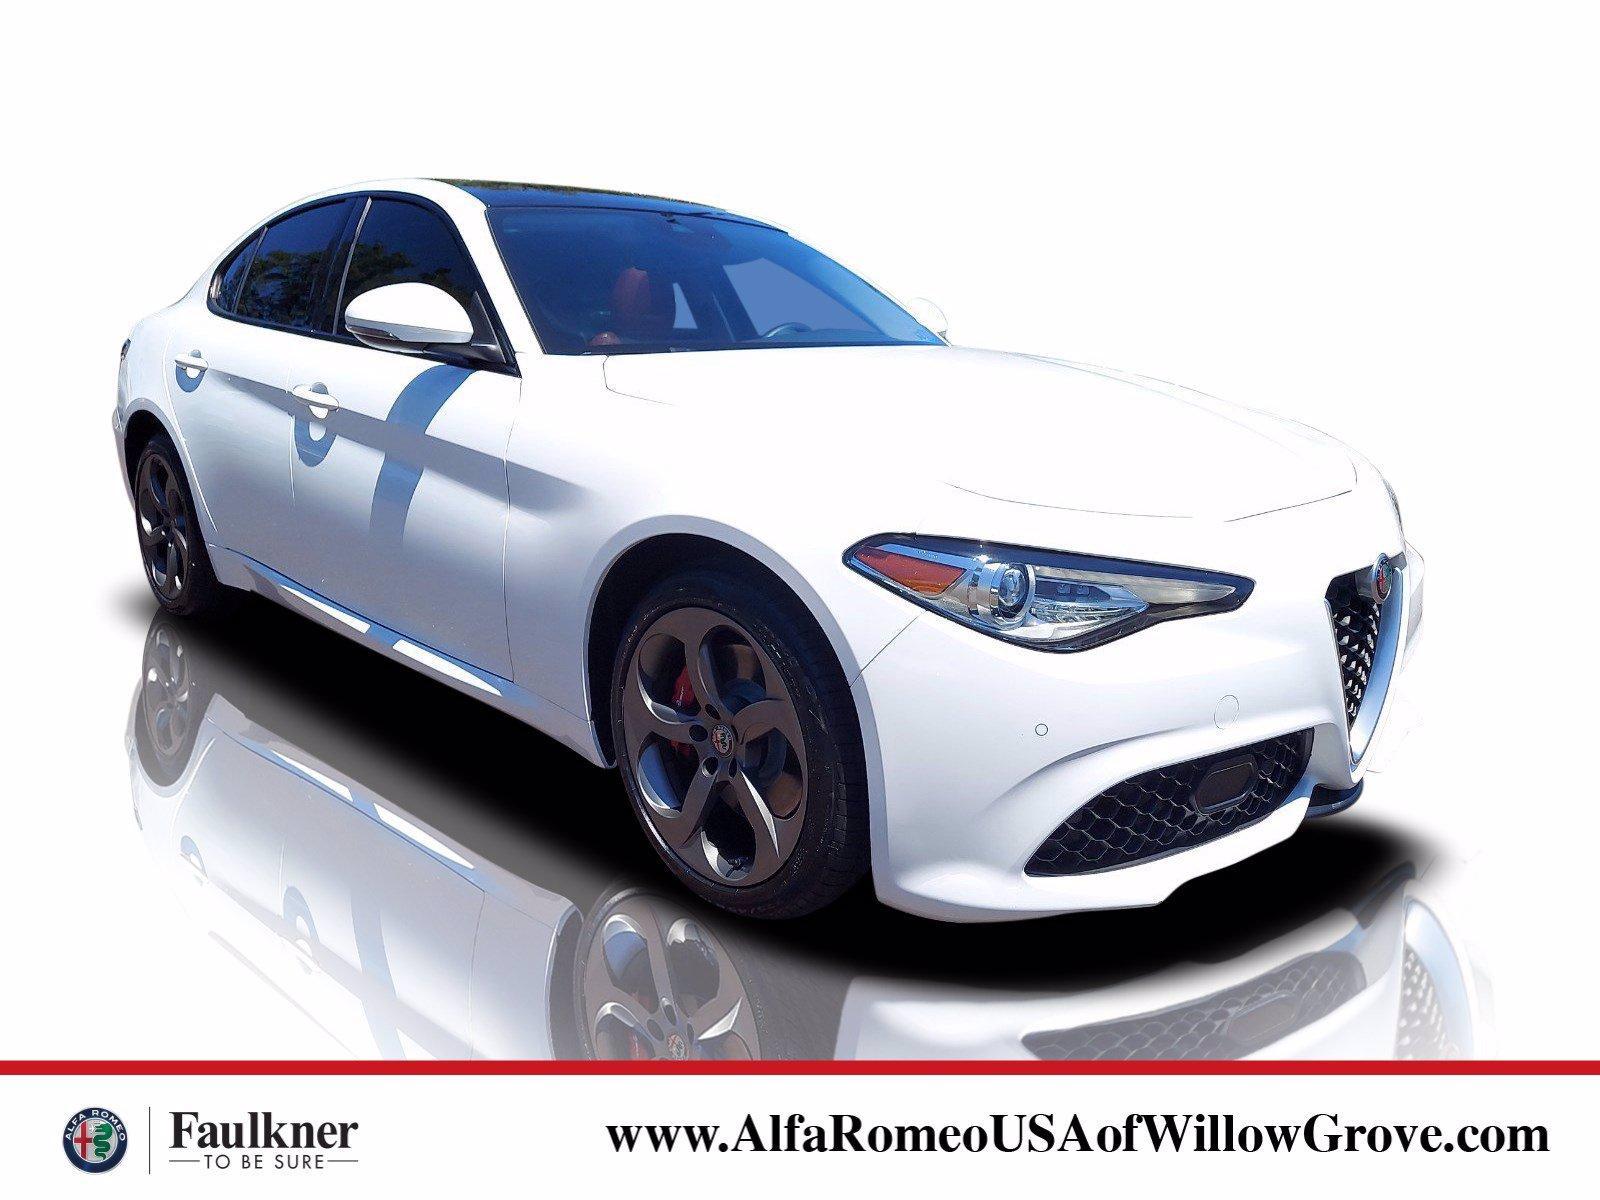 2018 Alfa Romeo Giulia Vehicle Photo in Willow Grove, PA 19090